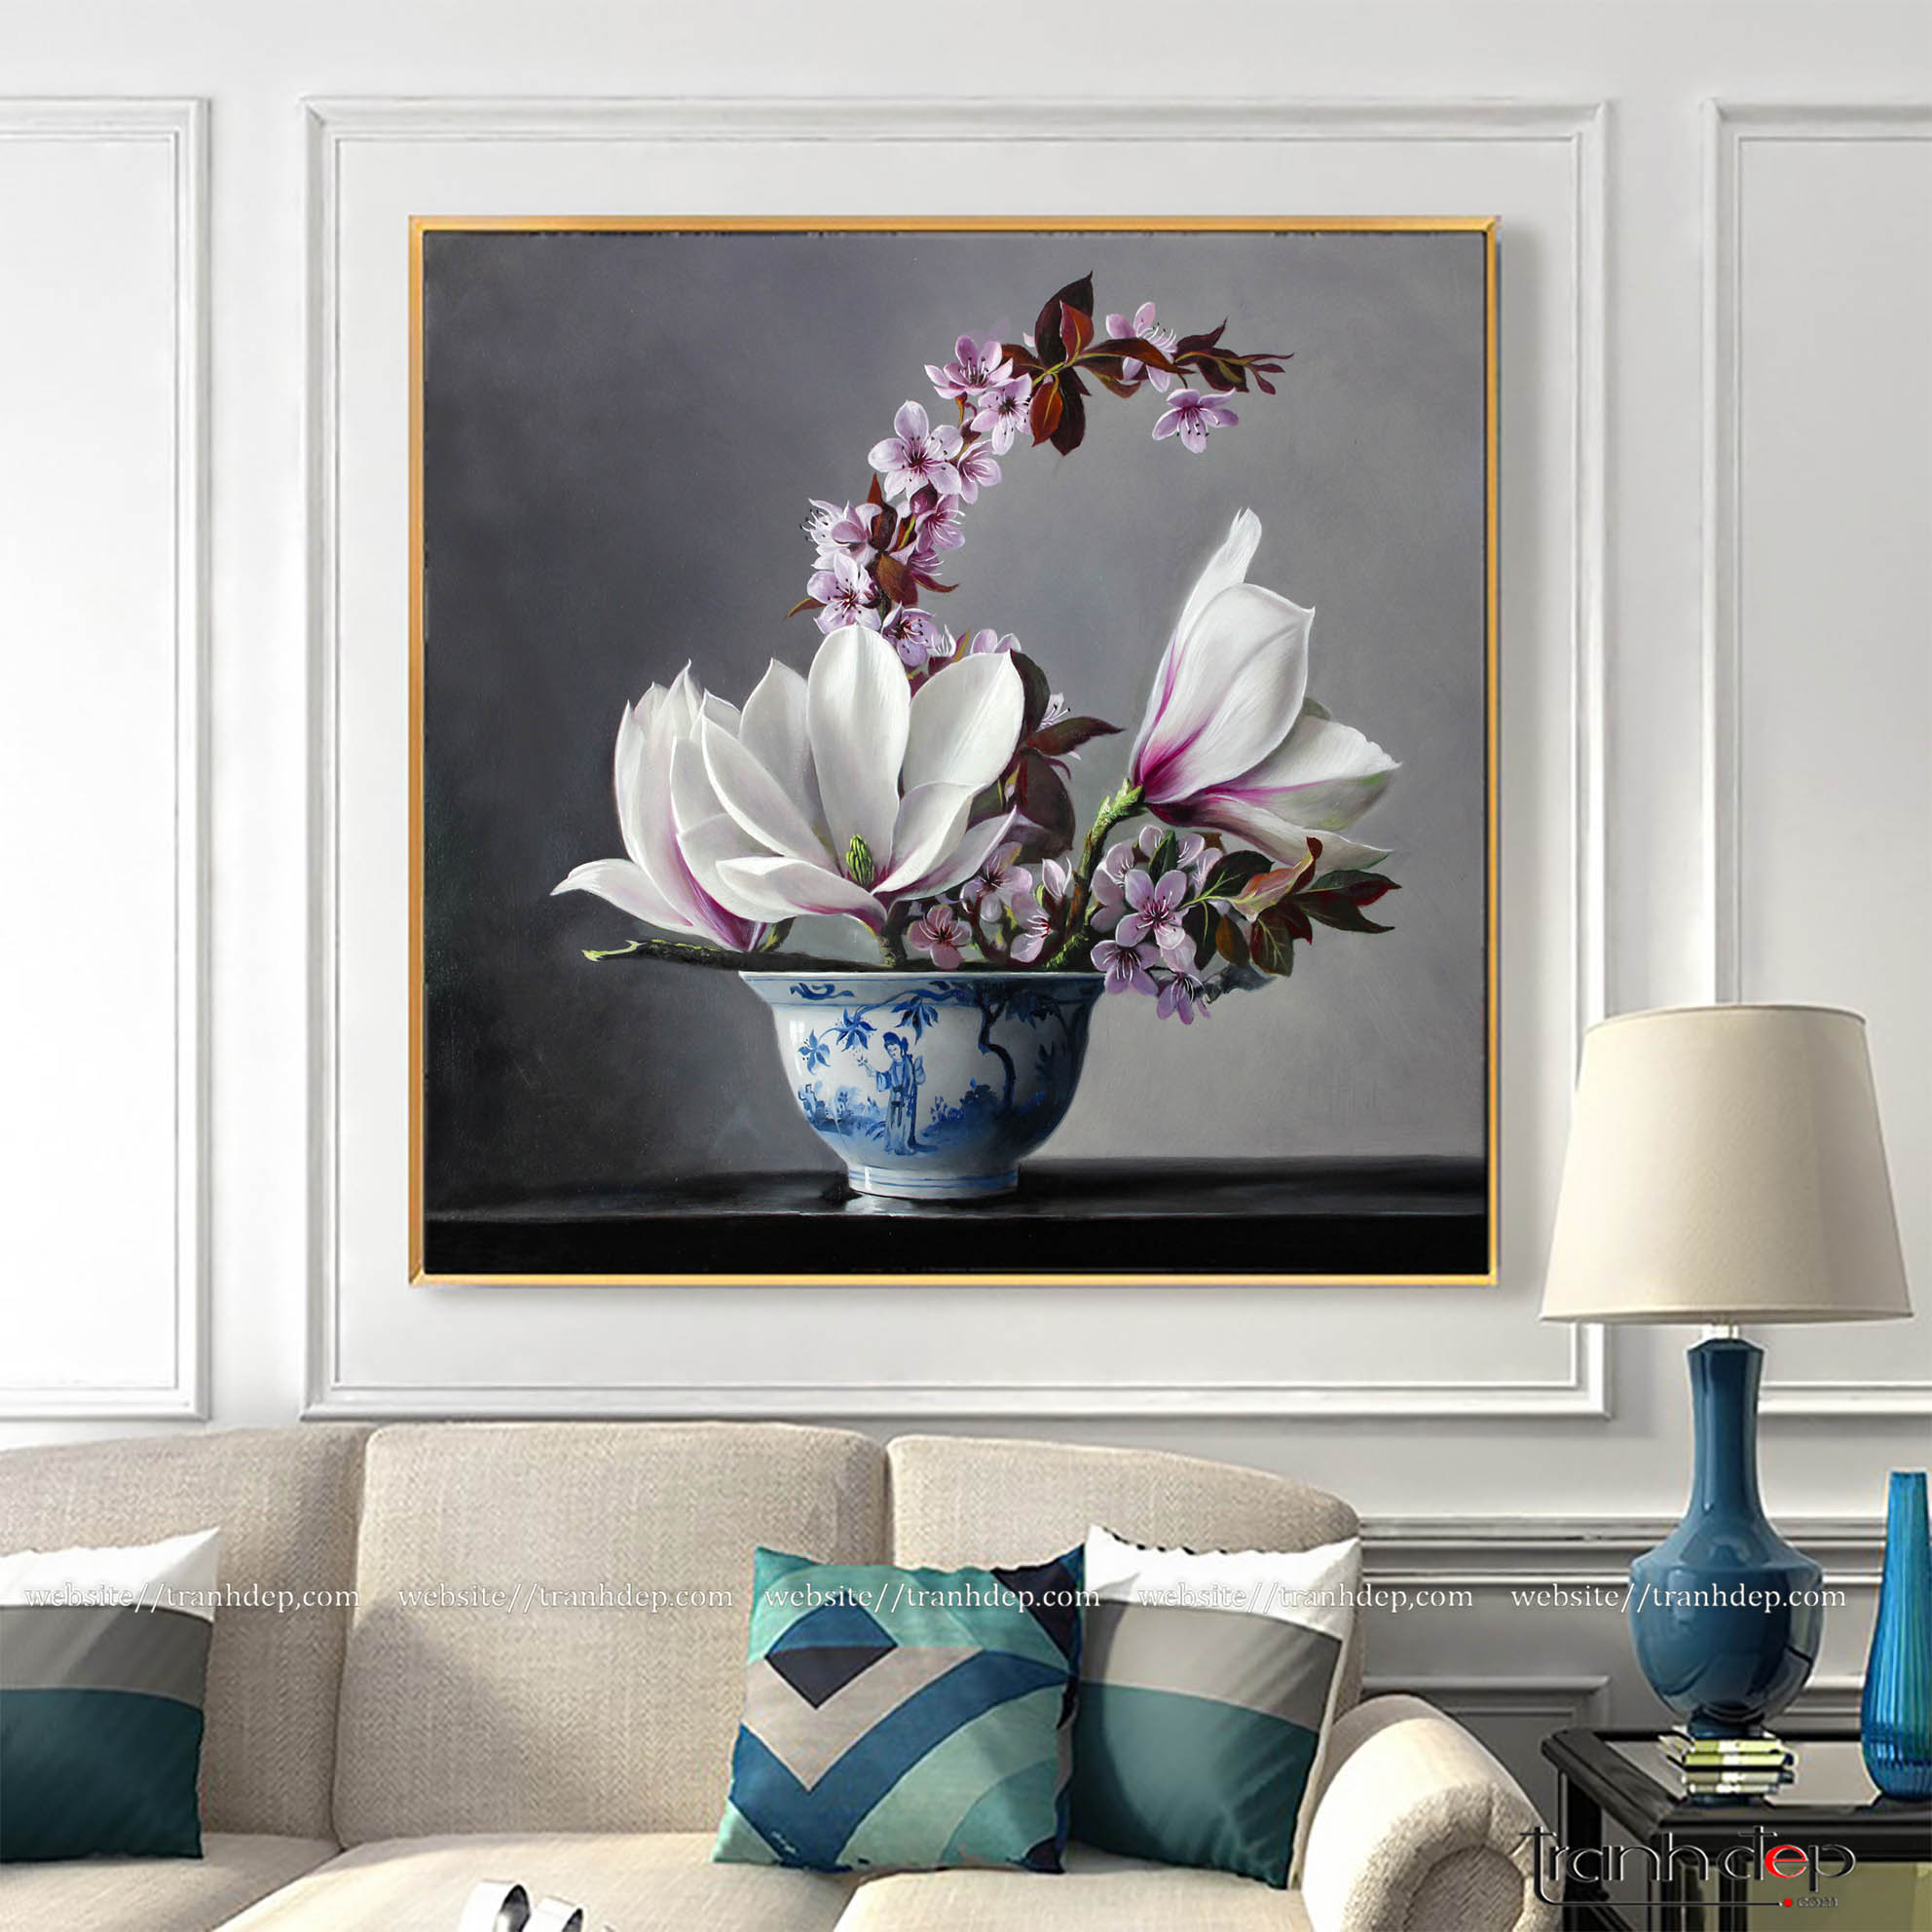 Tranh hoa treo tường